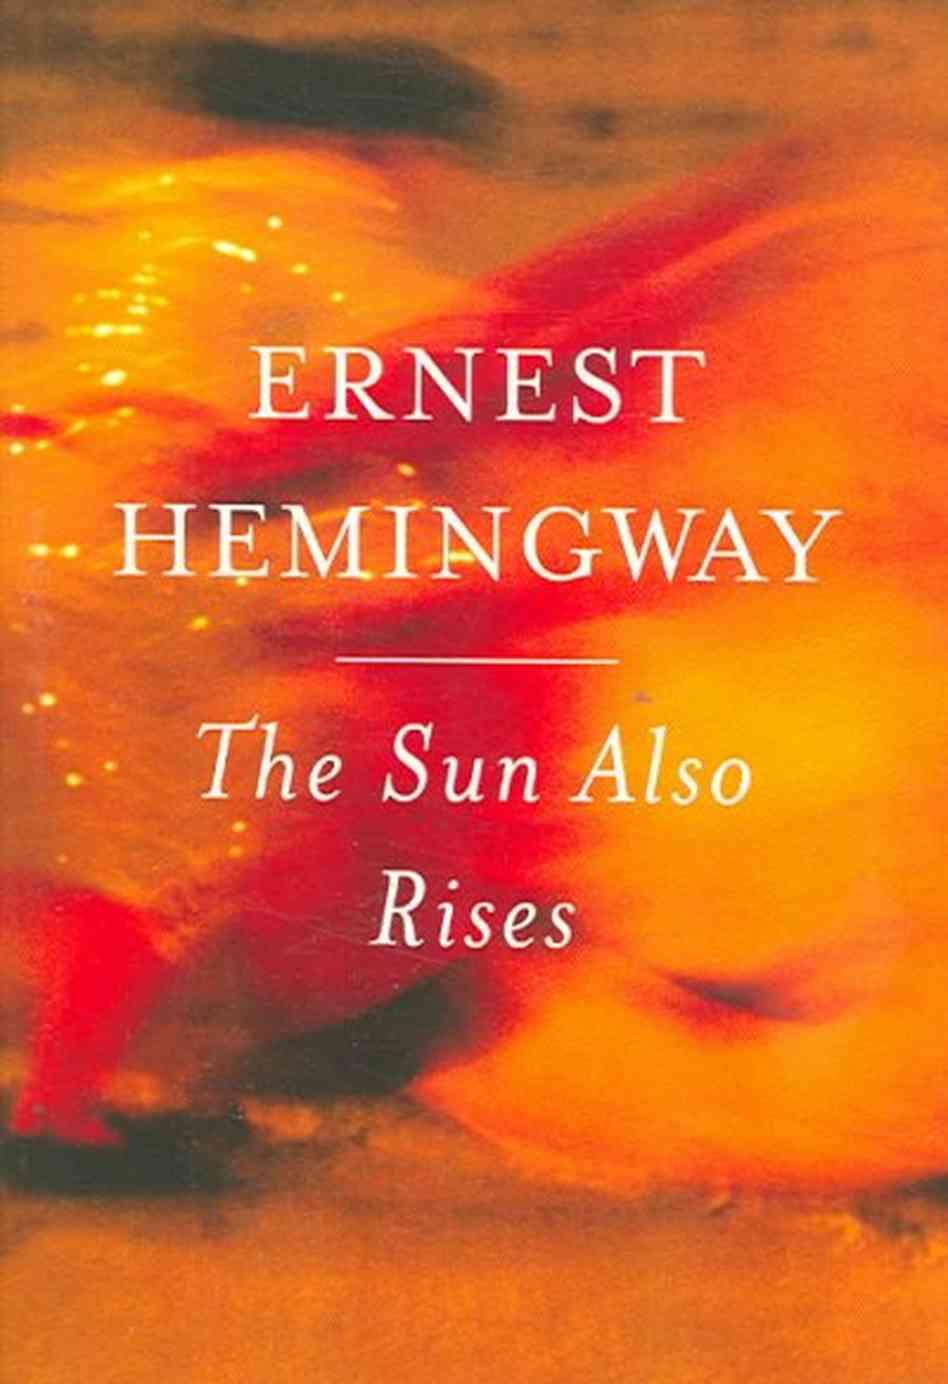 The Sun Also Rises by Ernest Hemingway Beautiful Book Novel Blog.jpg